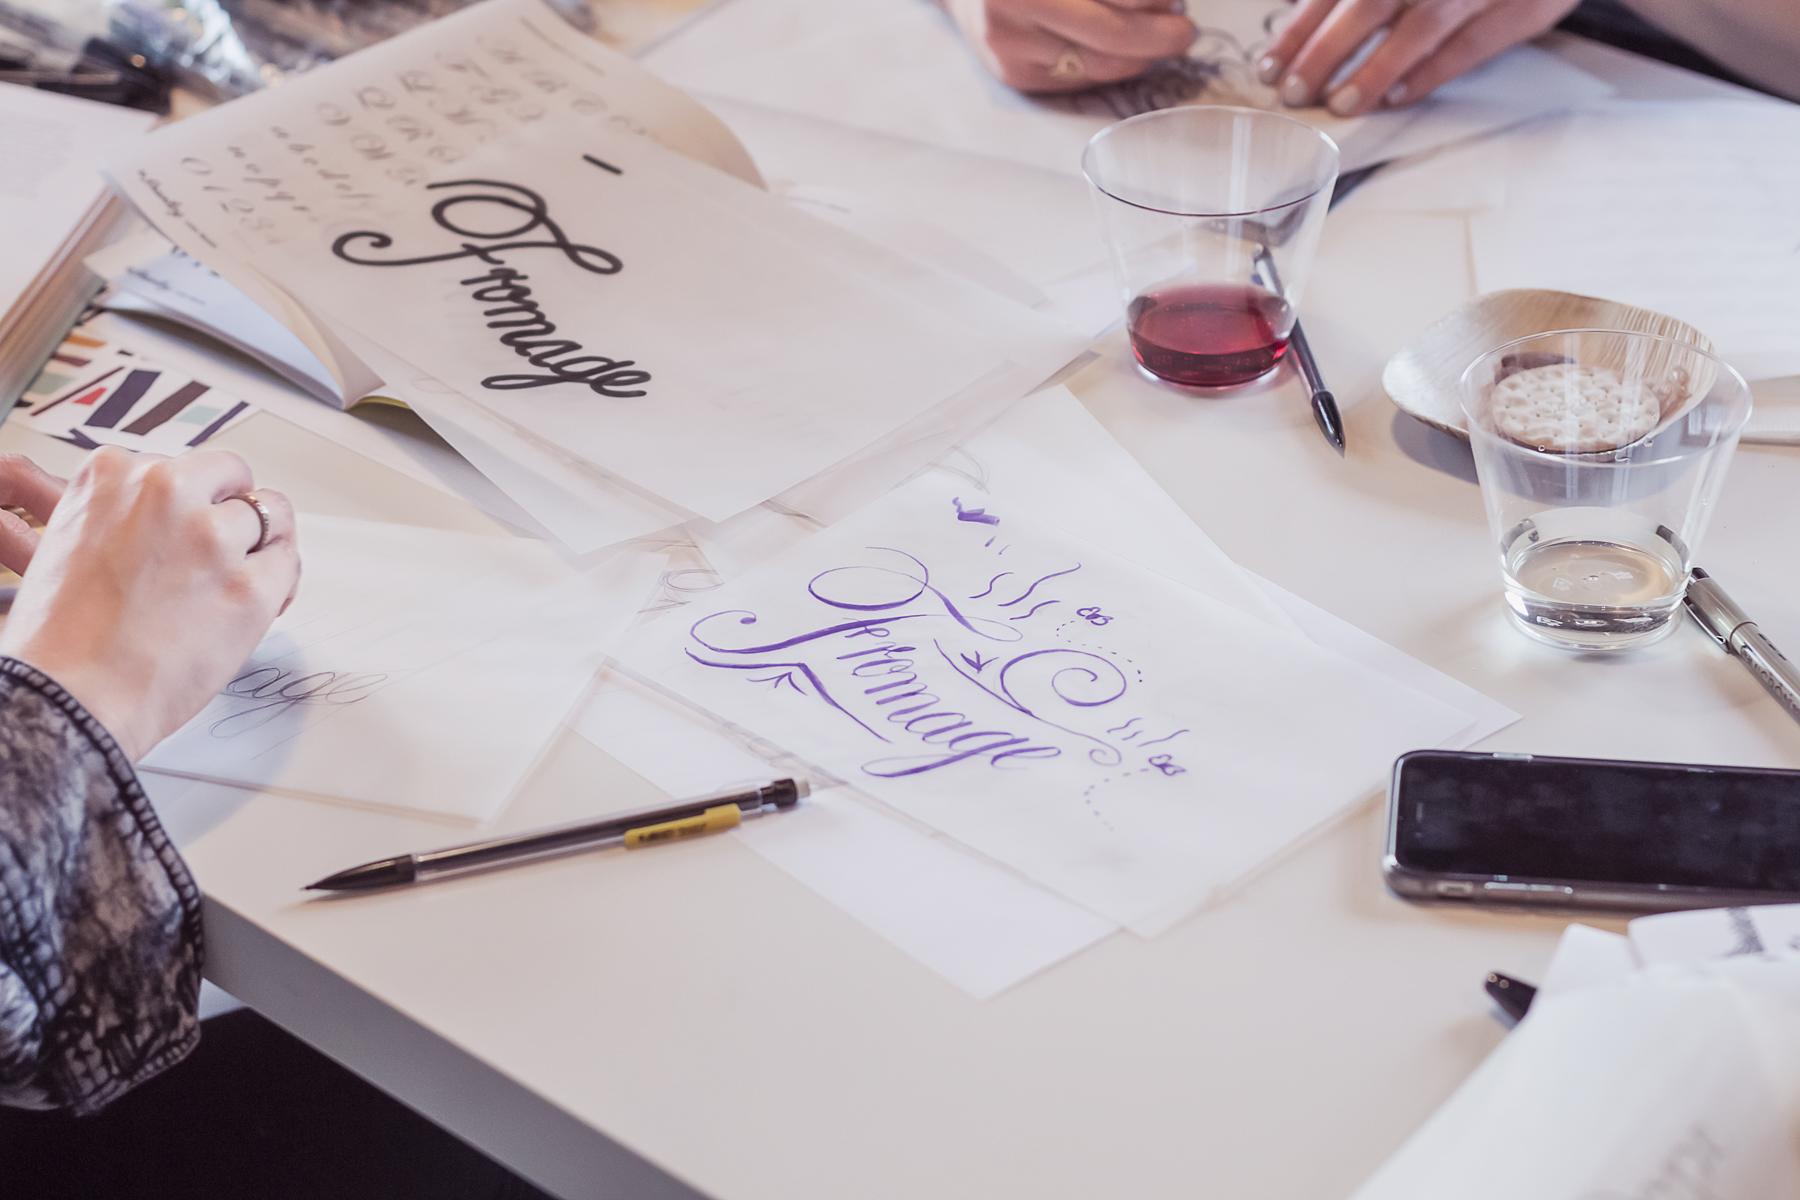 05.Drawnking_AfterClass_0014.jpg